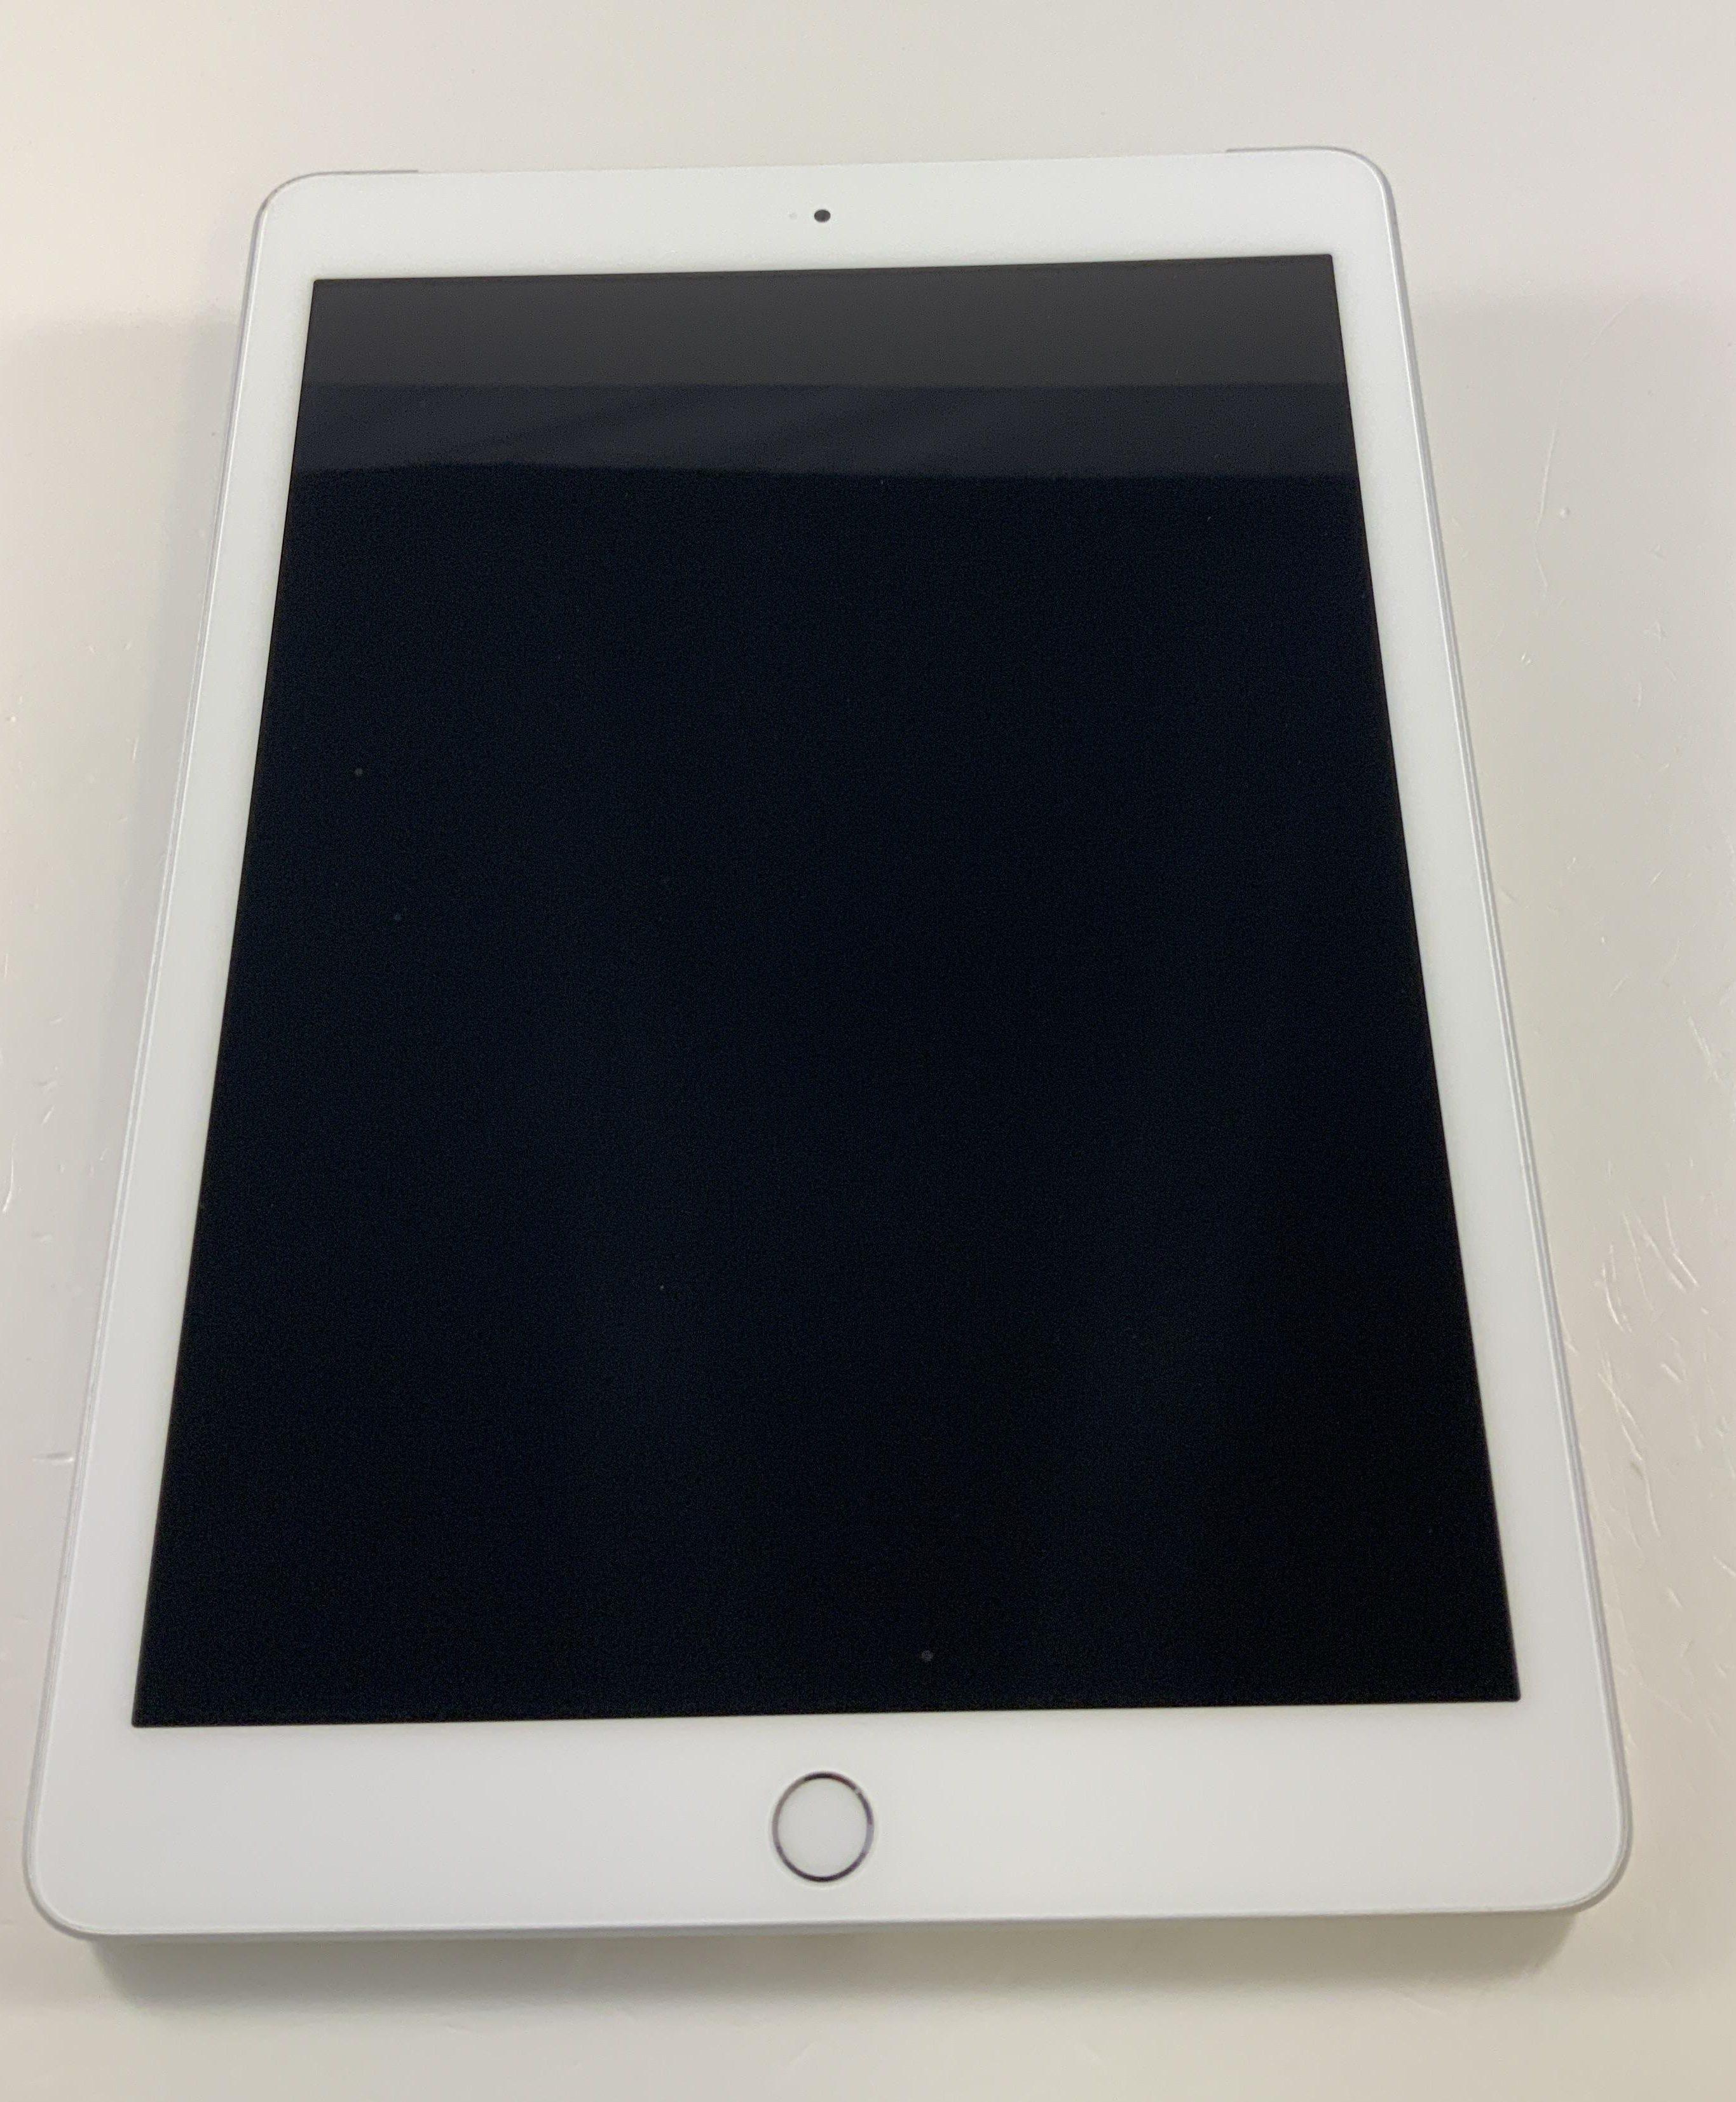 iPad 6 Wi-Fi + Cellular 128GB, 128GB, Silver, bild 1